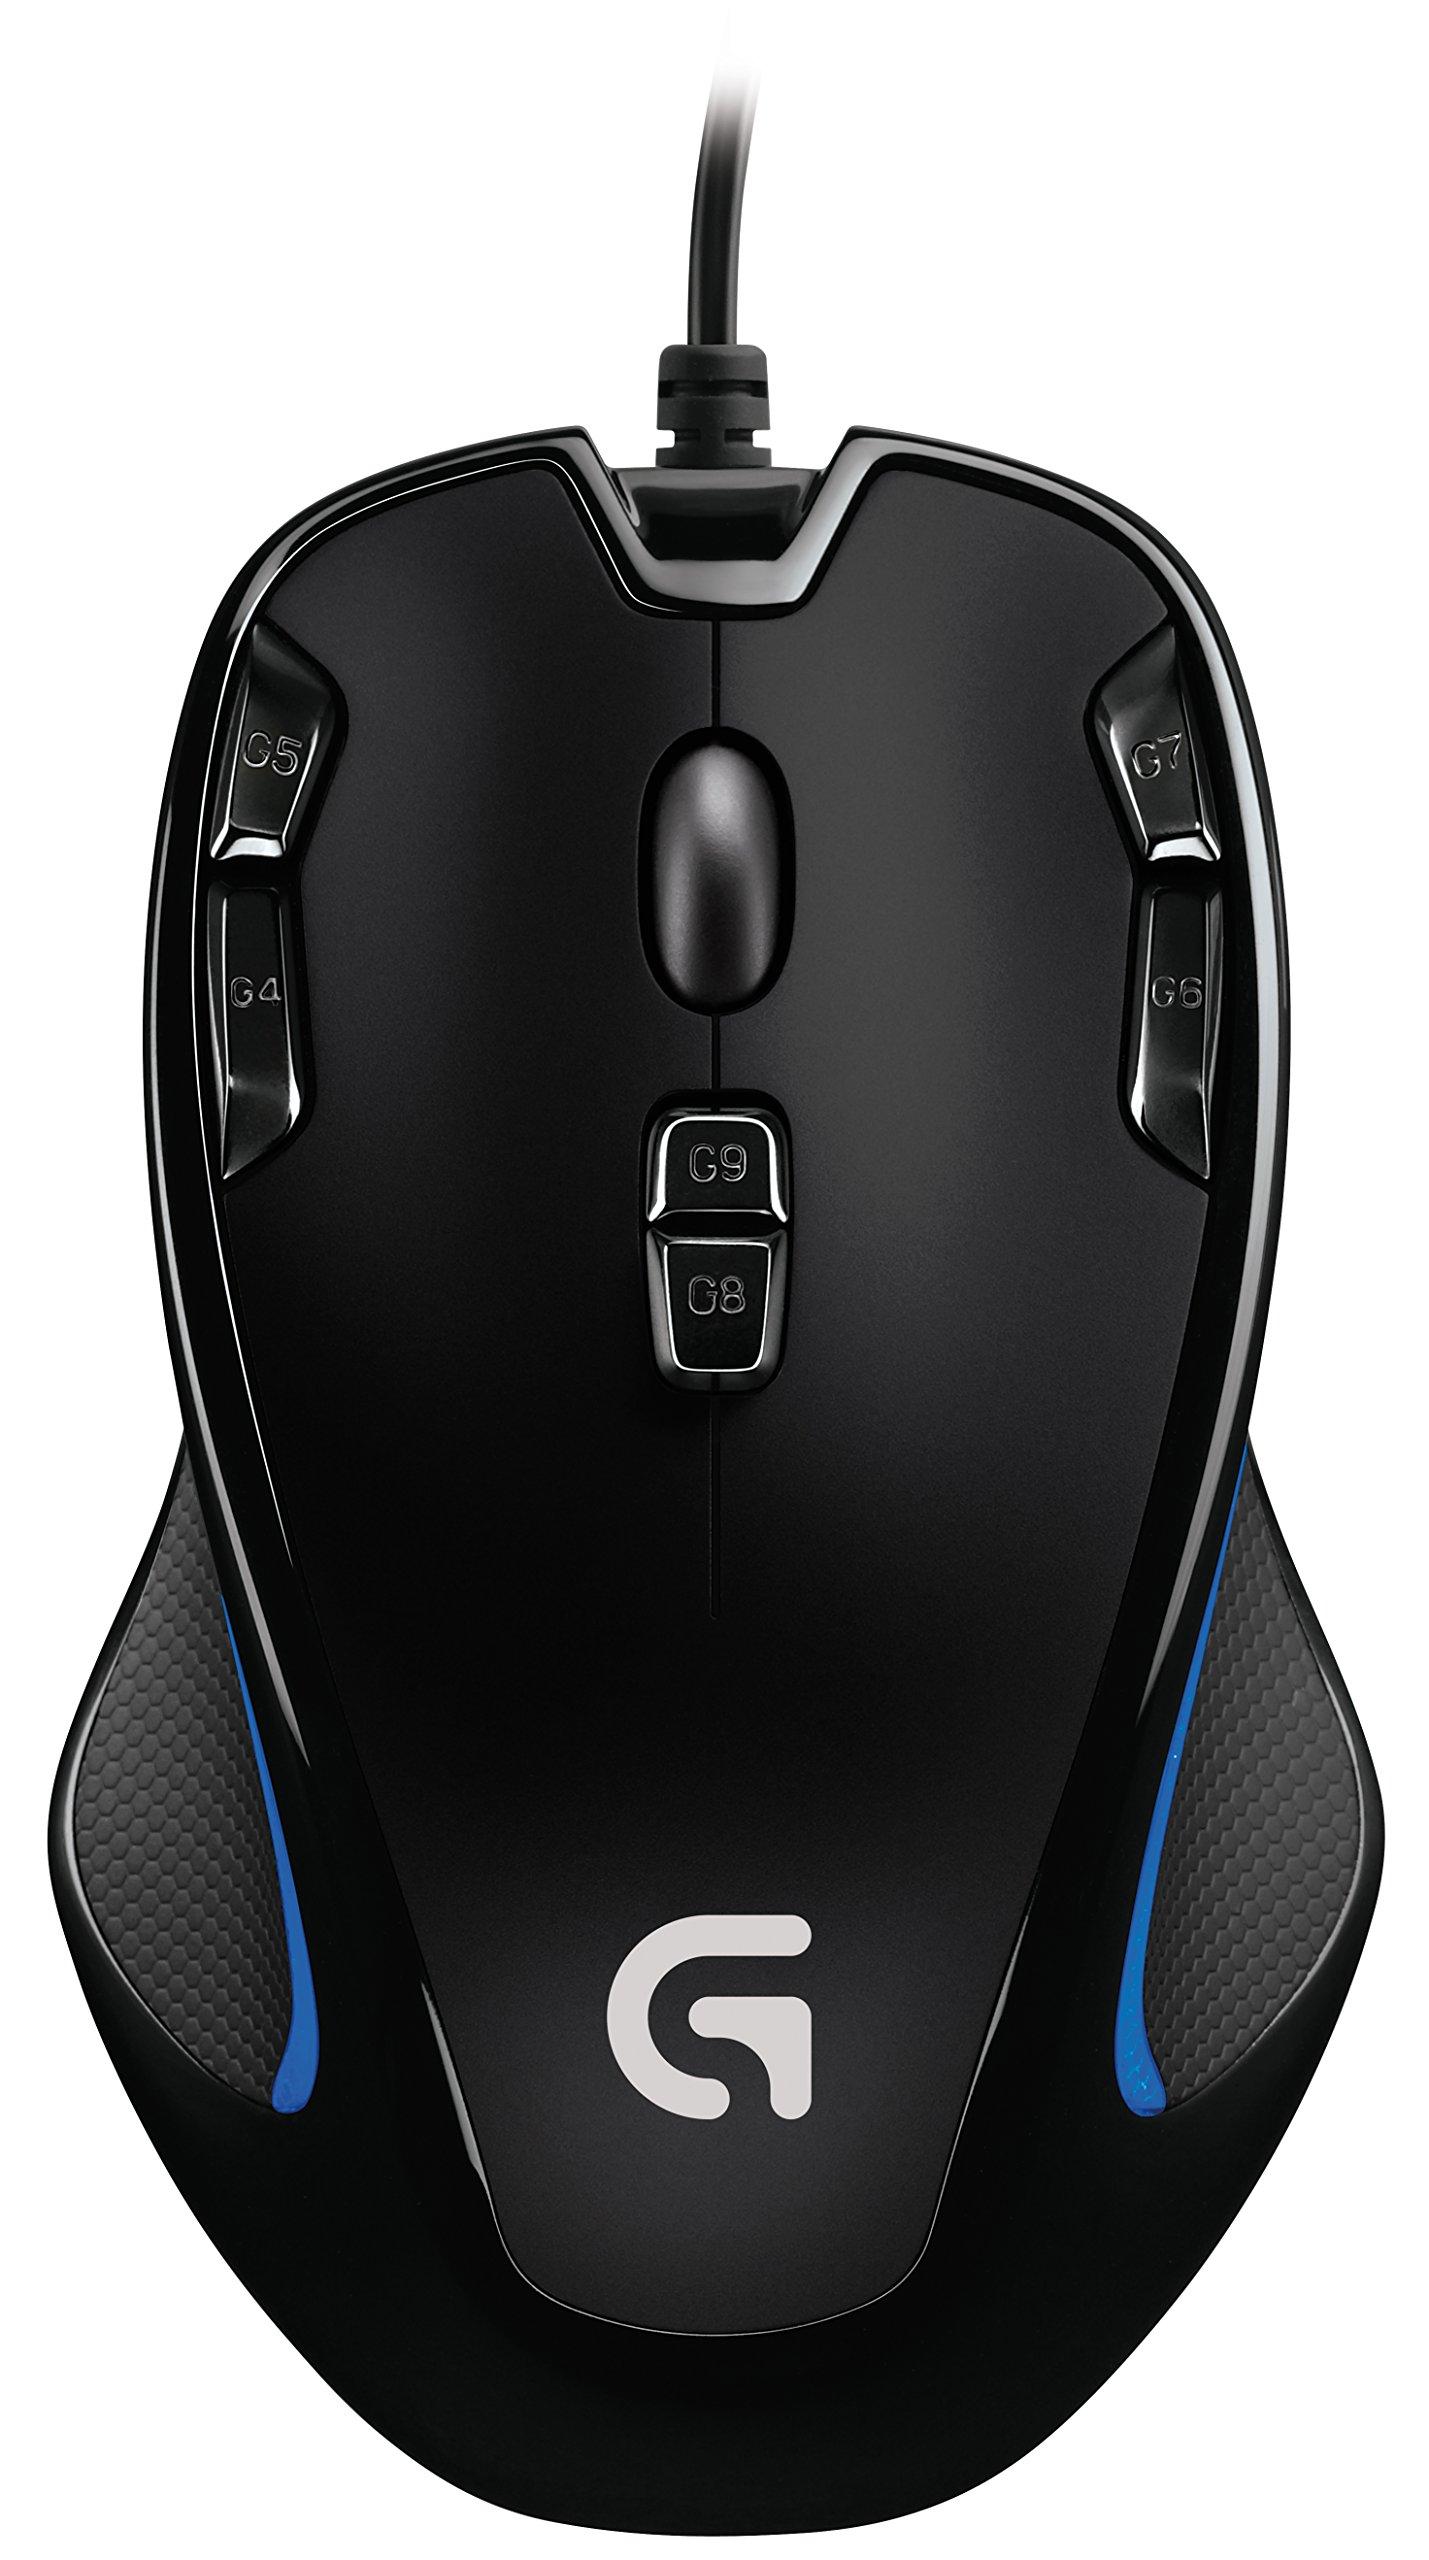 Mouse Gamer :  Logitech G300s Optical Ambidextrous  – 9 Prog